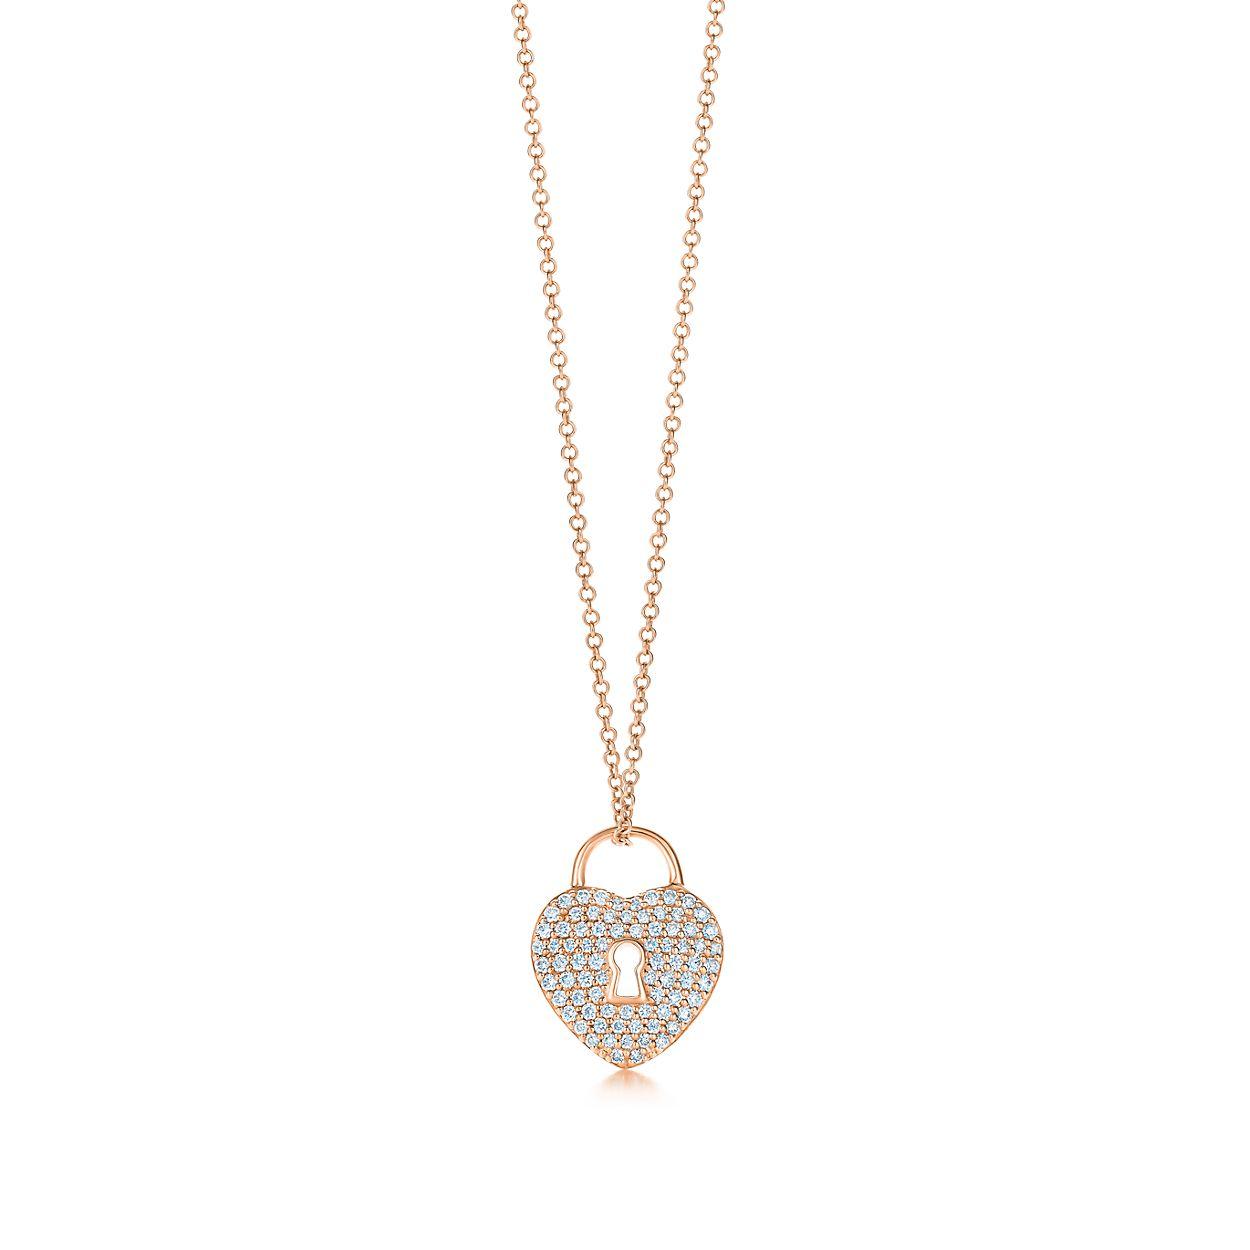 18k rose gold and diamond heart lock pendant tiffany co tiffany locksheart lock pendant tiffany locksheart lock pendant aloadofball Gallery